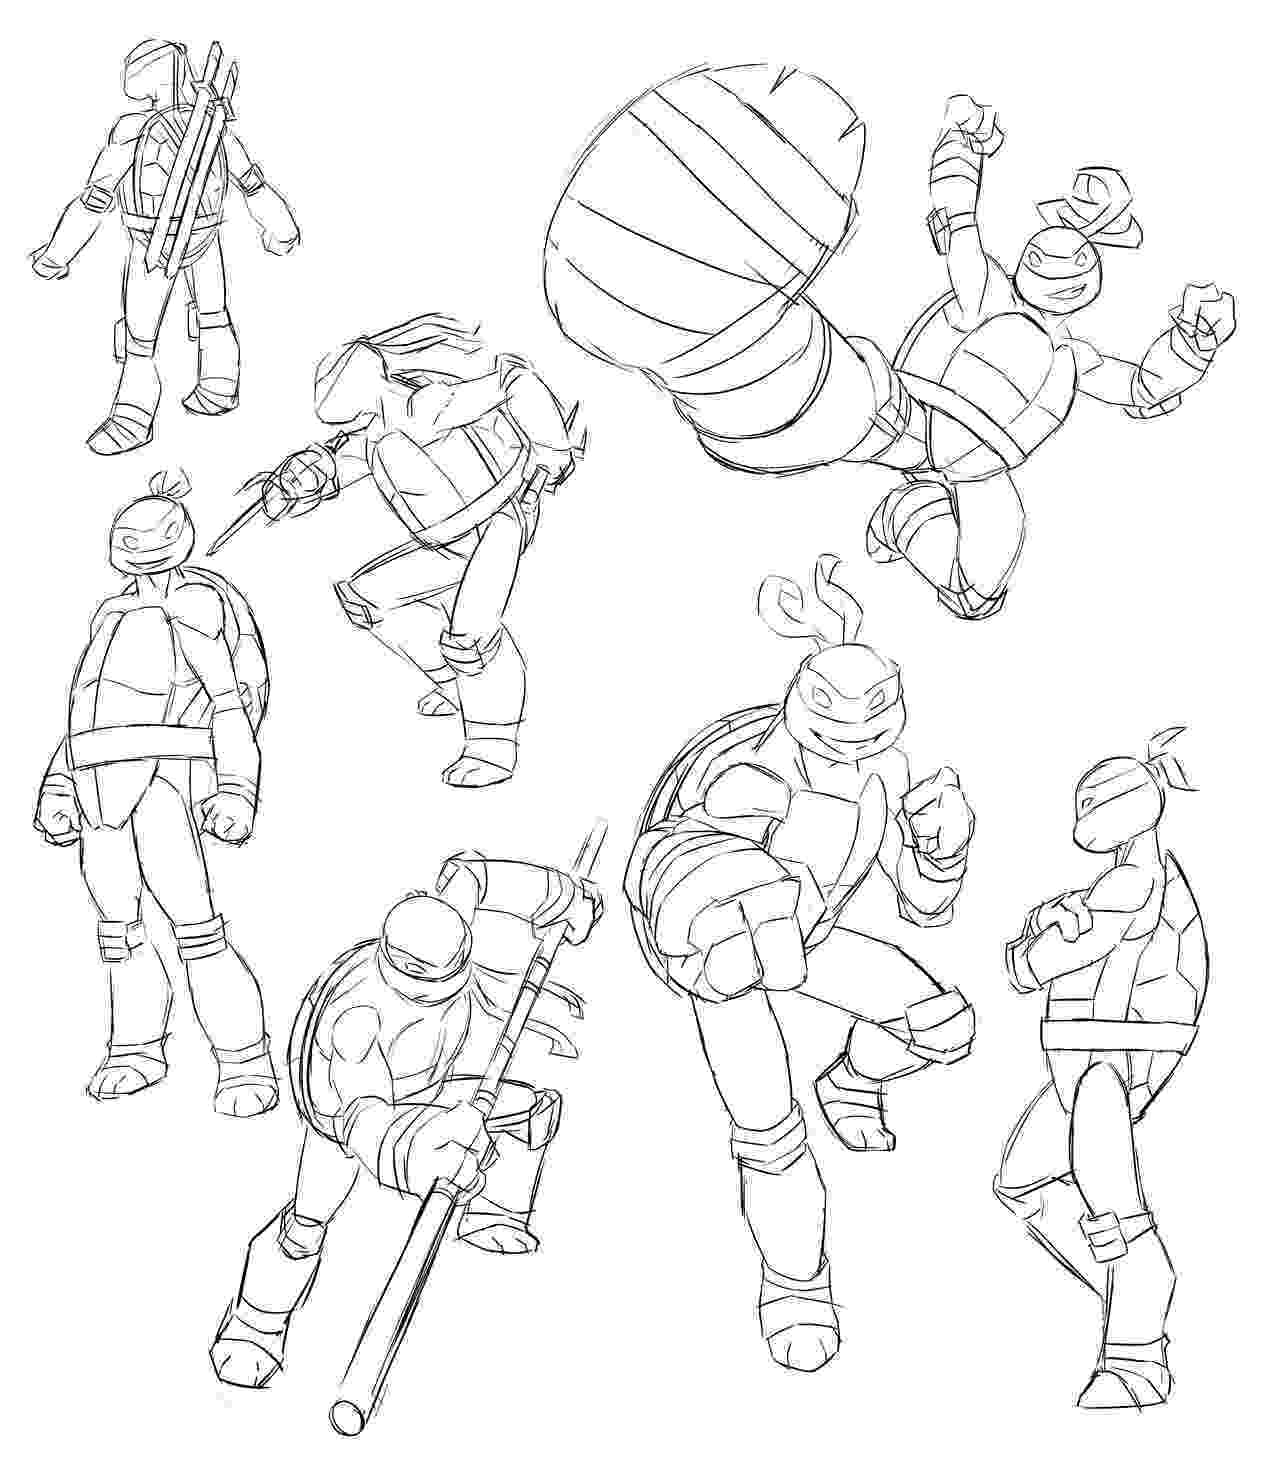 nickelodeon tmnt coloring pages 44 nickelodeon tmnt coloring pages 15 ninja turtles pages coloring nickelodeon tmnt